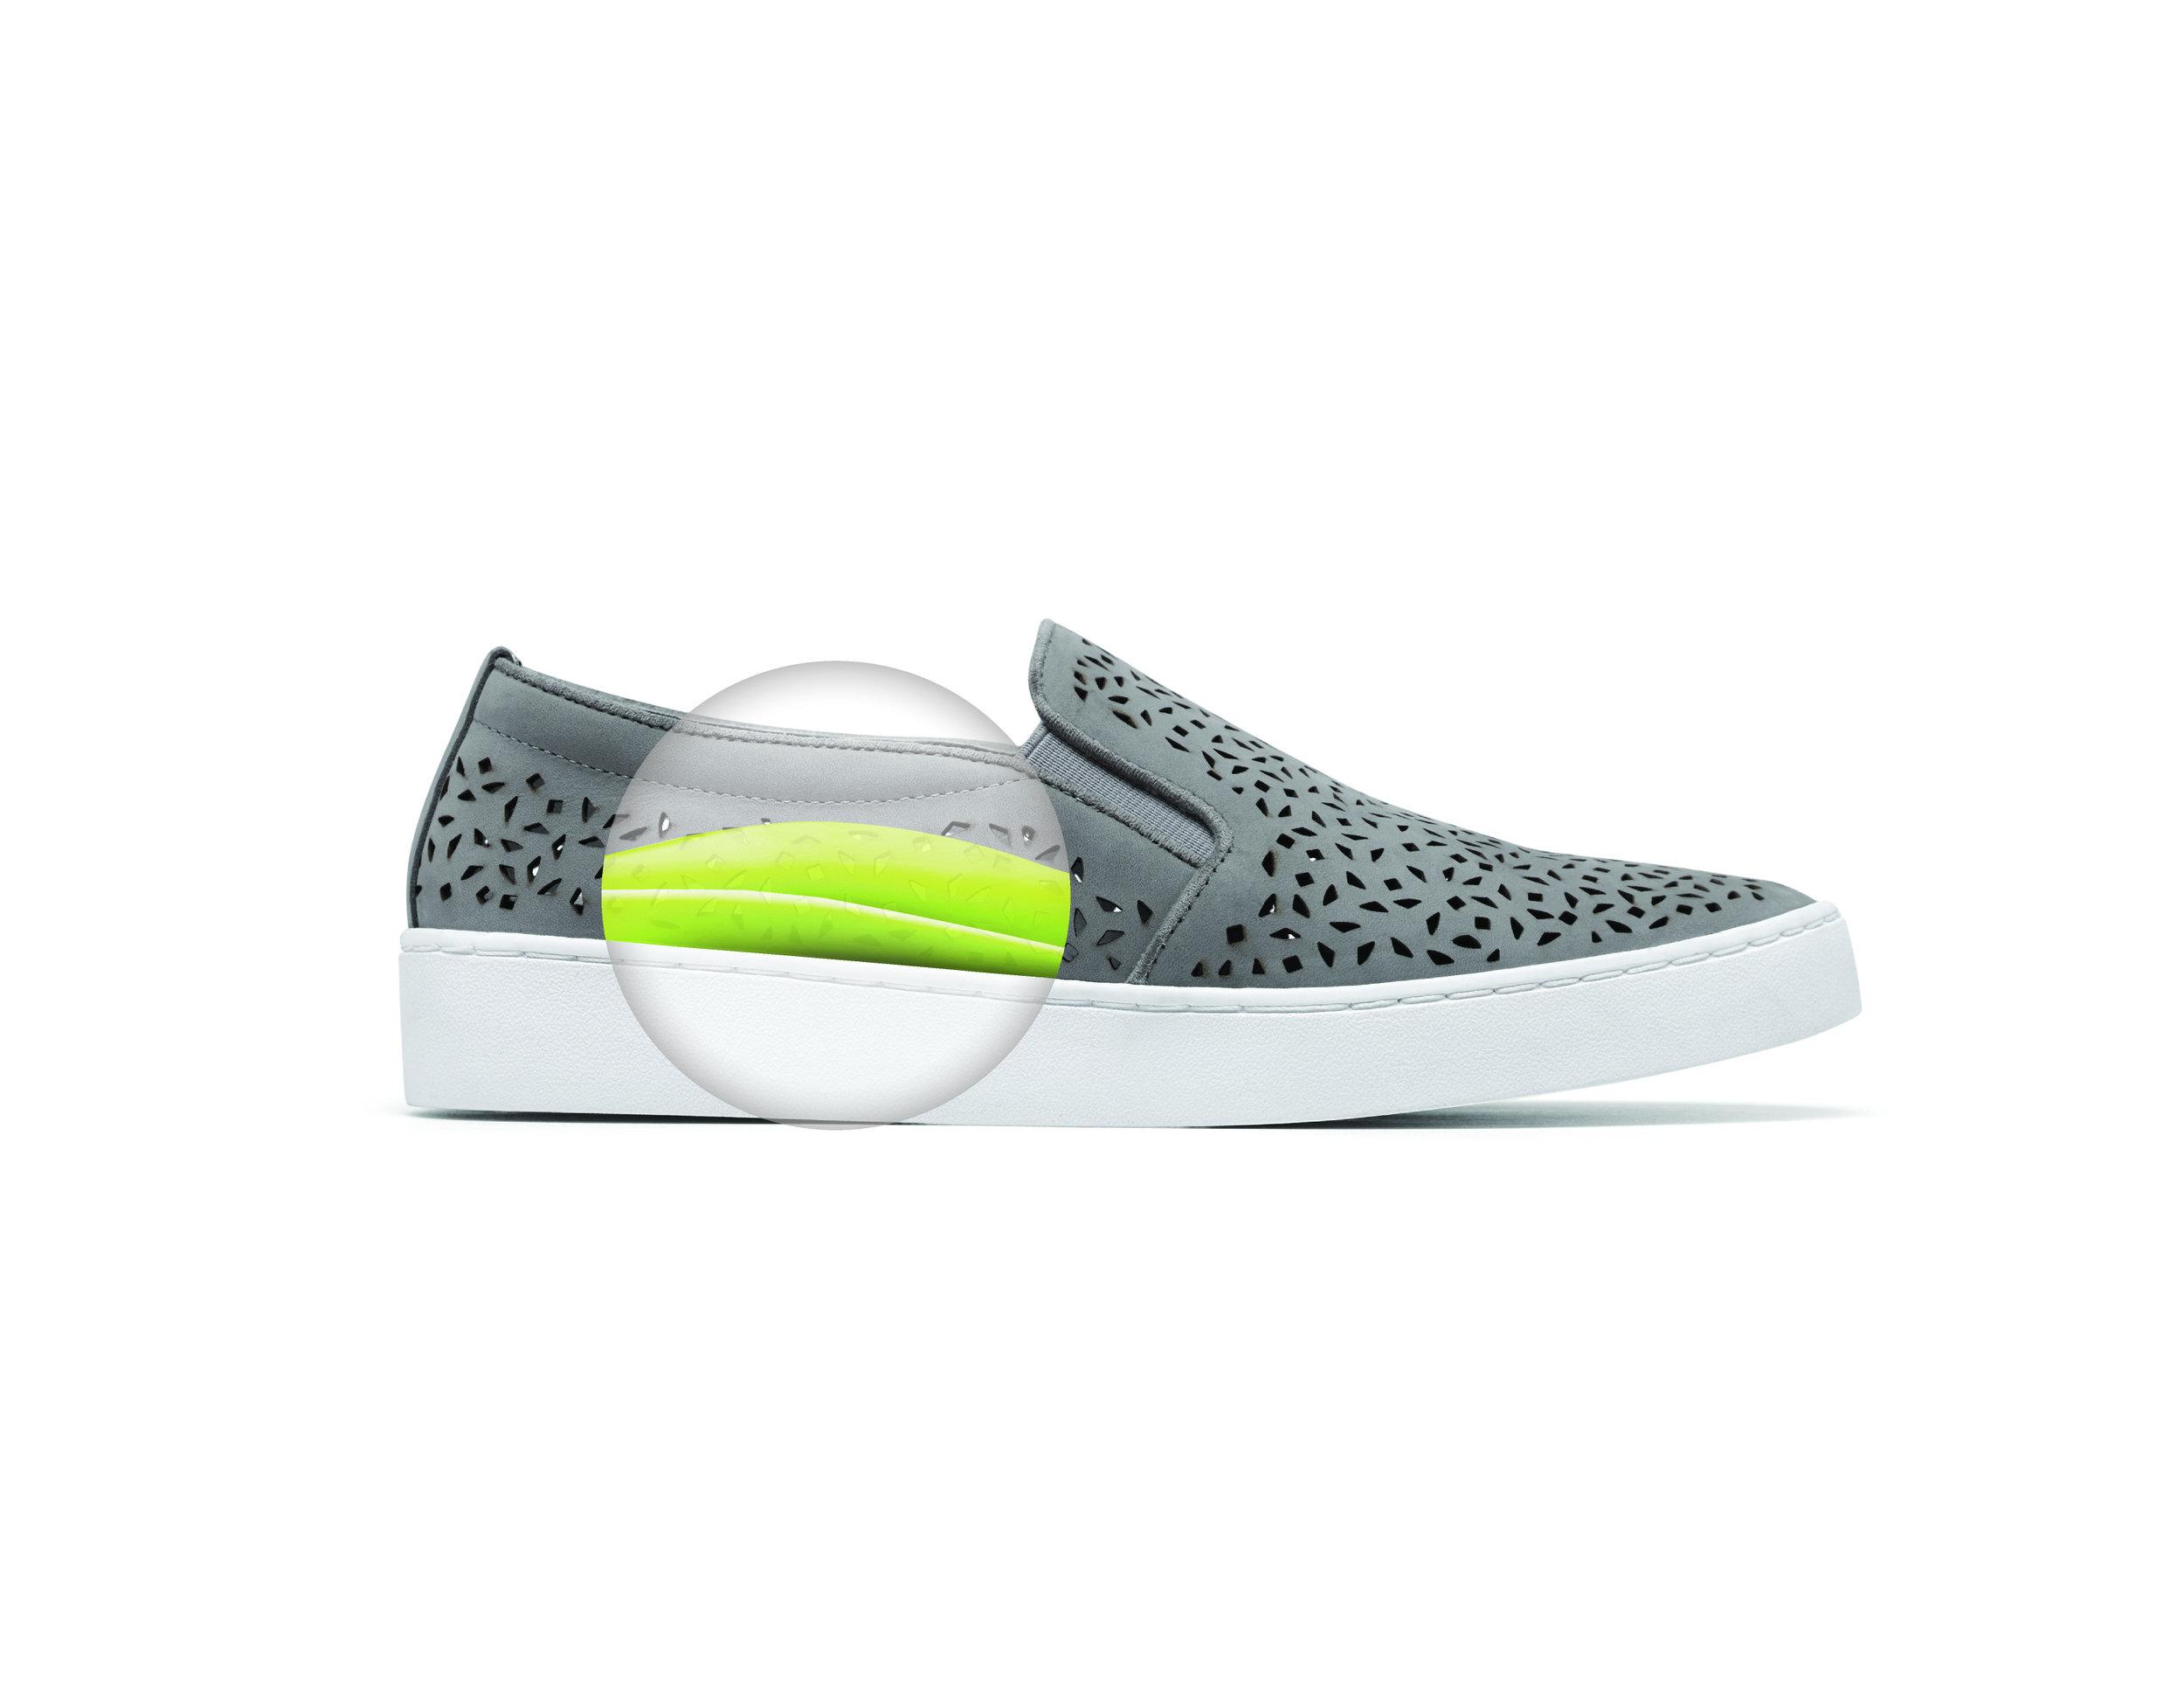 Vionic Midi Perf shoe review.jpg